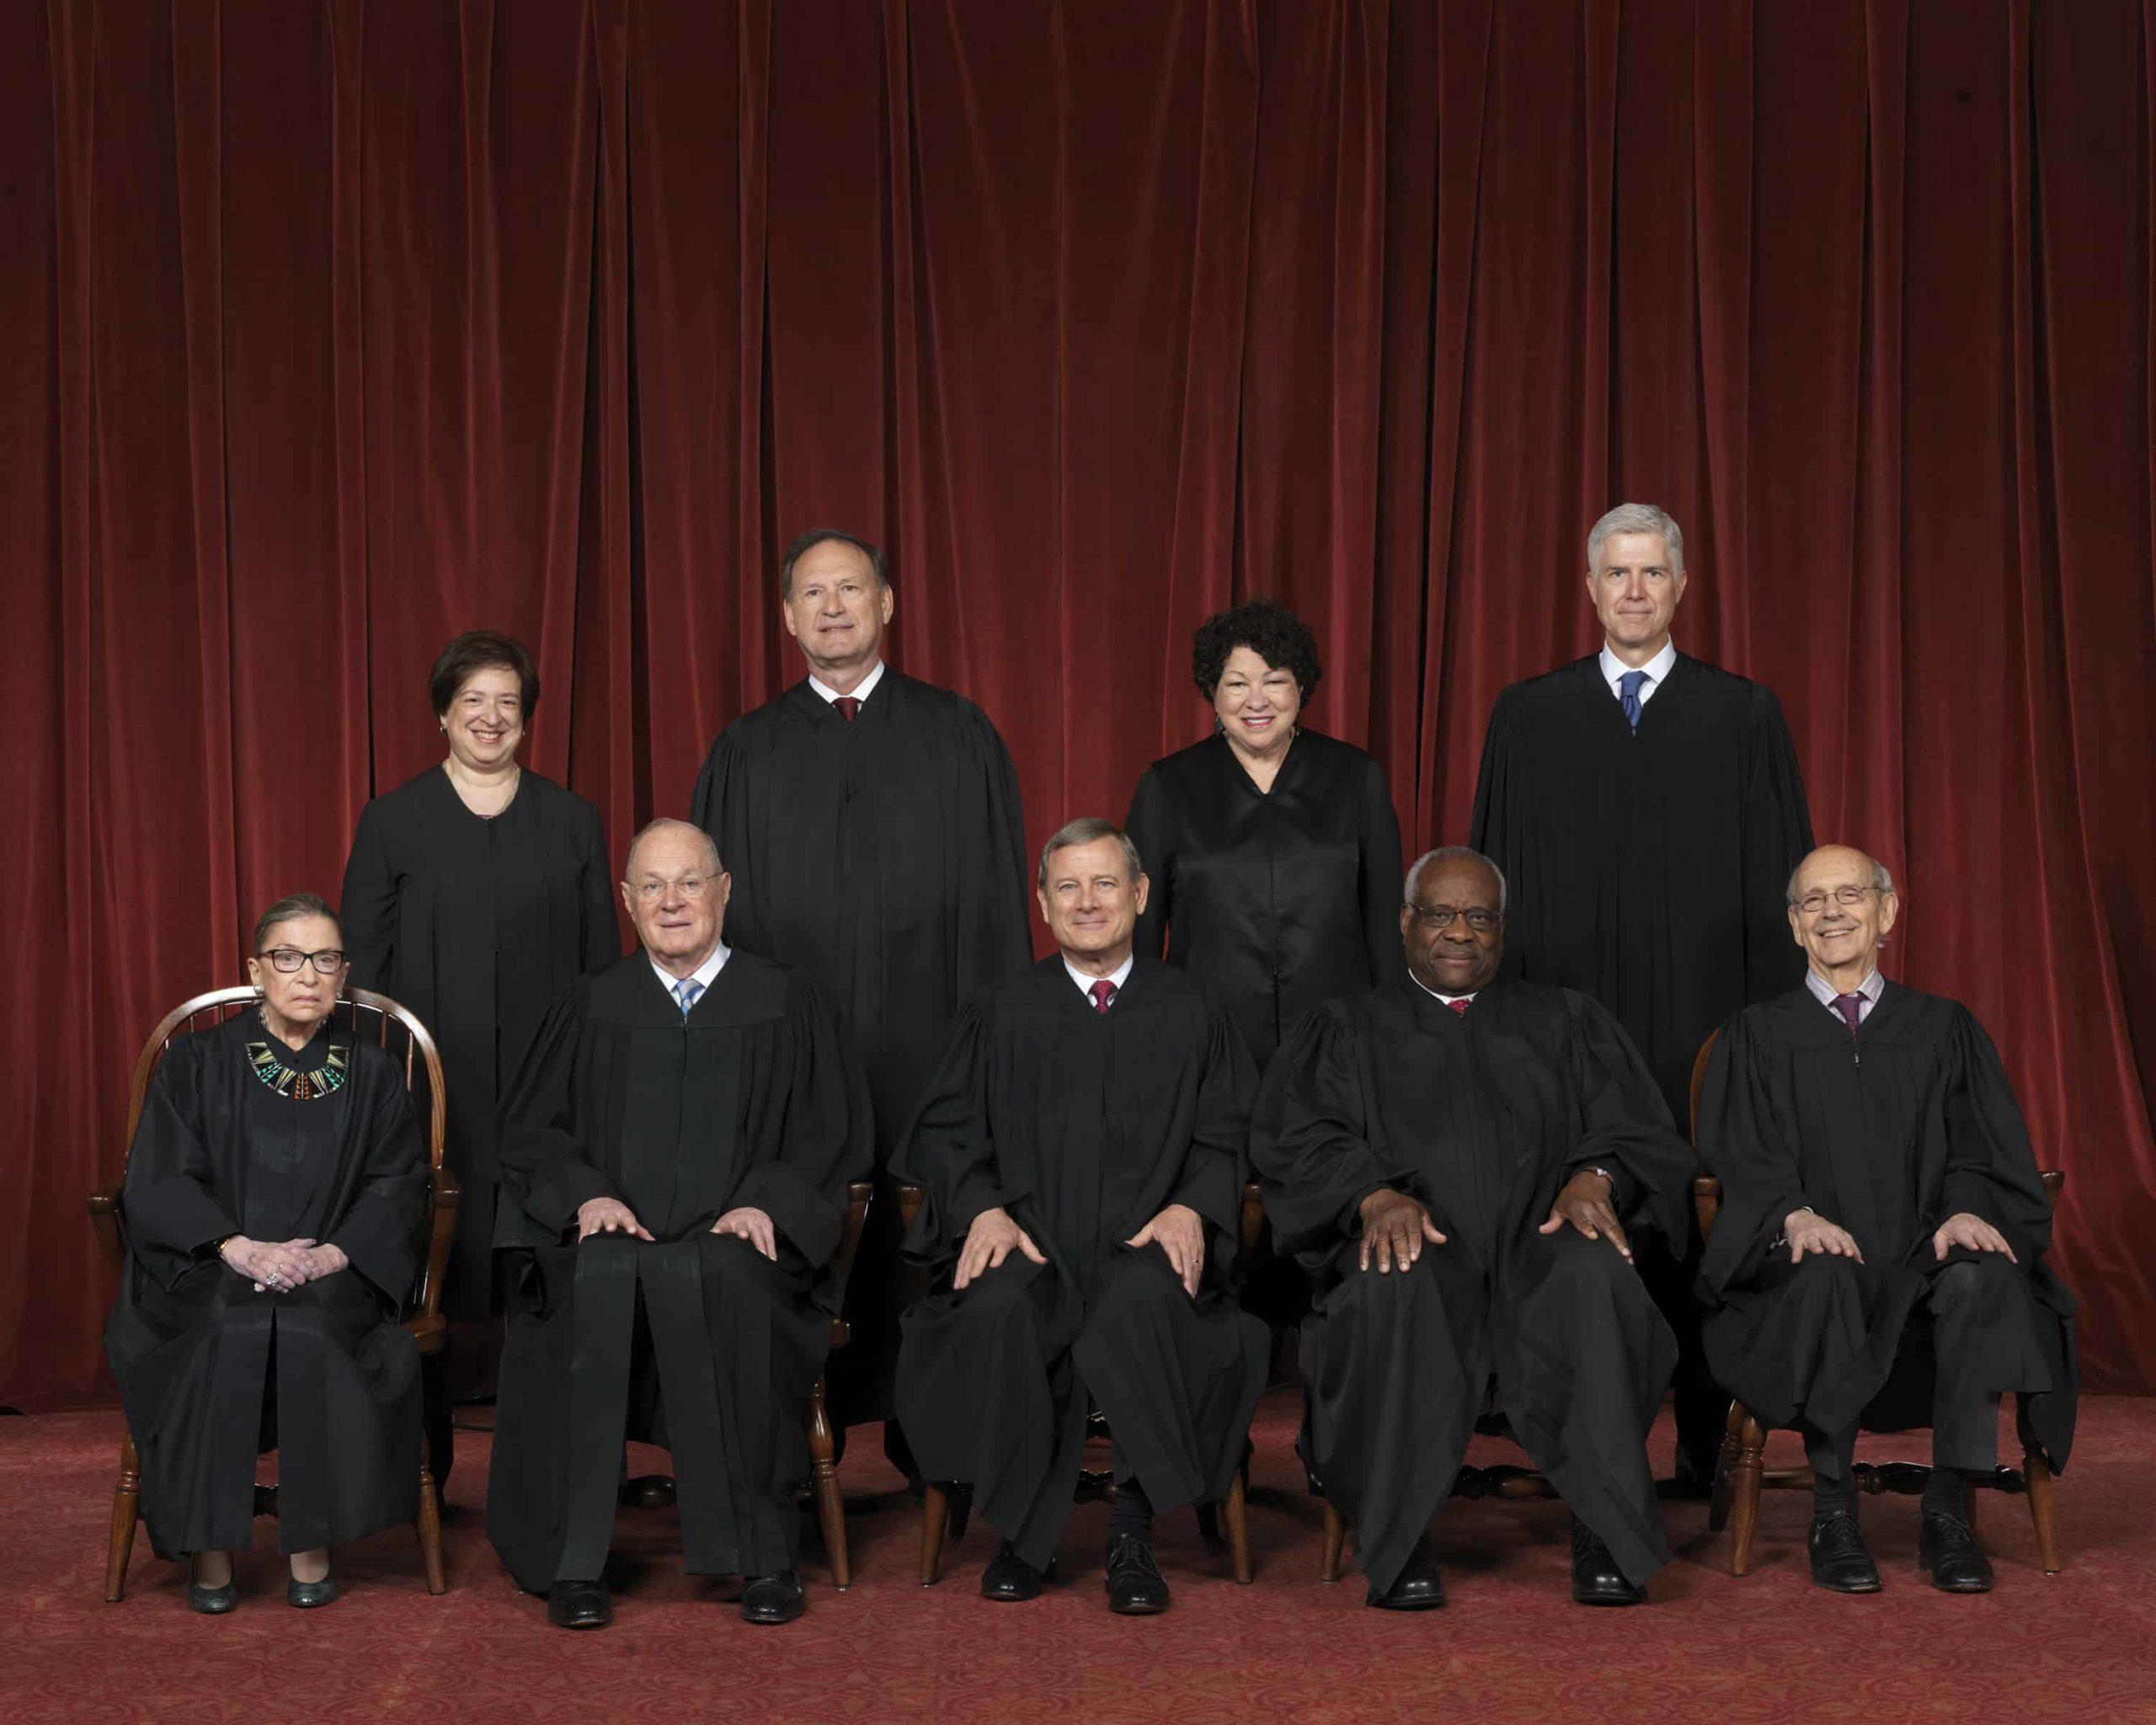 Image: Franz Jantzen, Collection of the Supreme Court of the United States - Collection of the Supreme Court of the United States